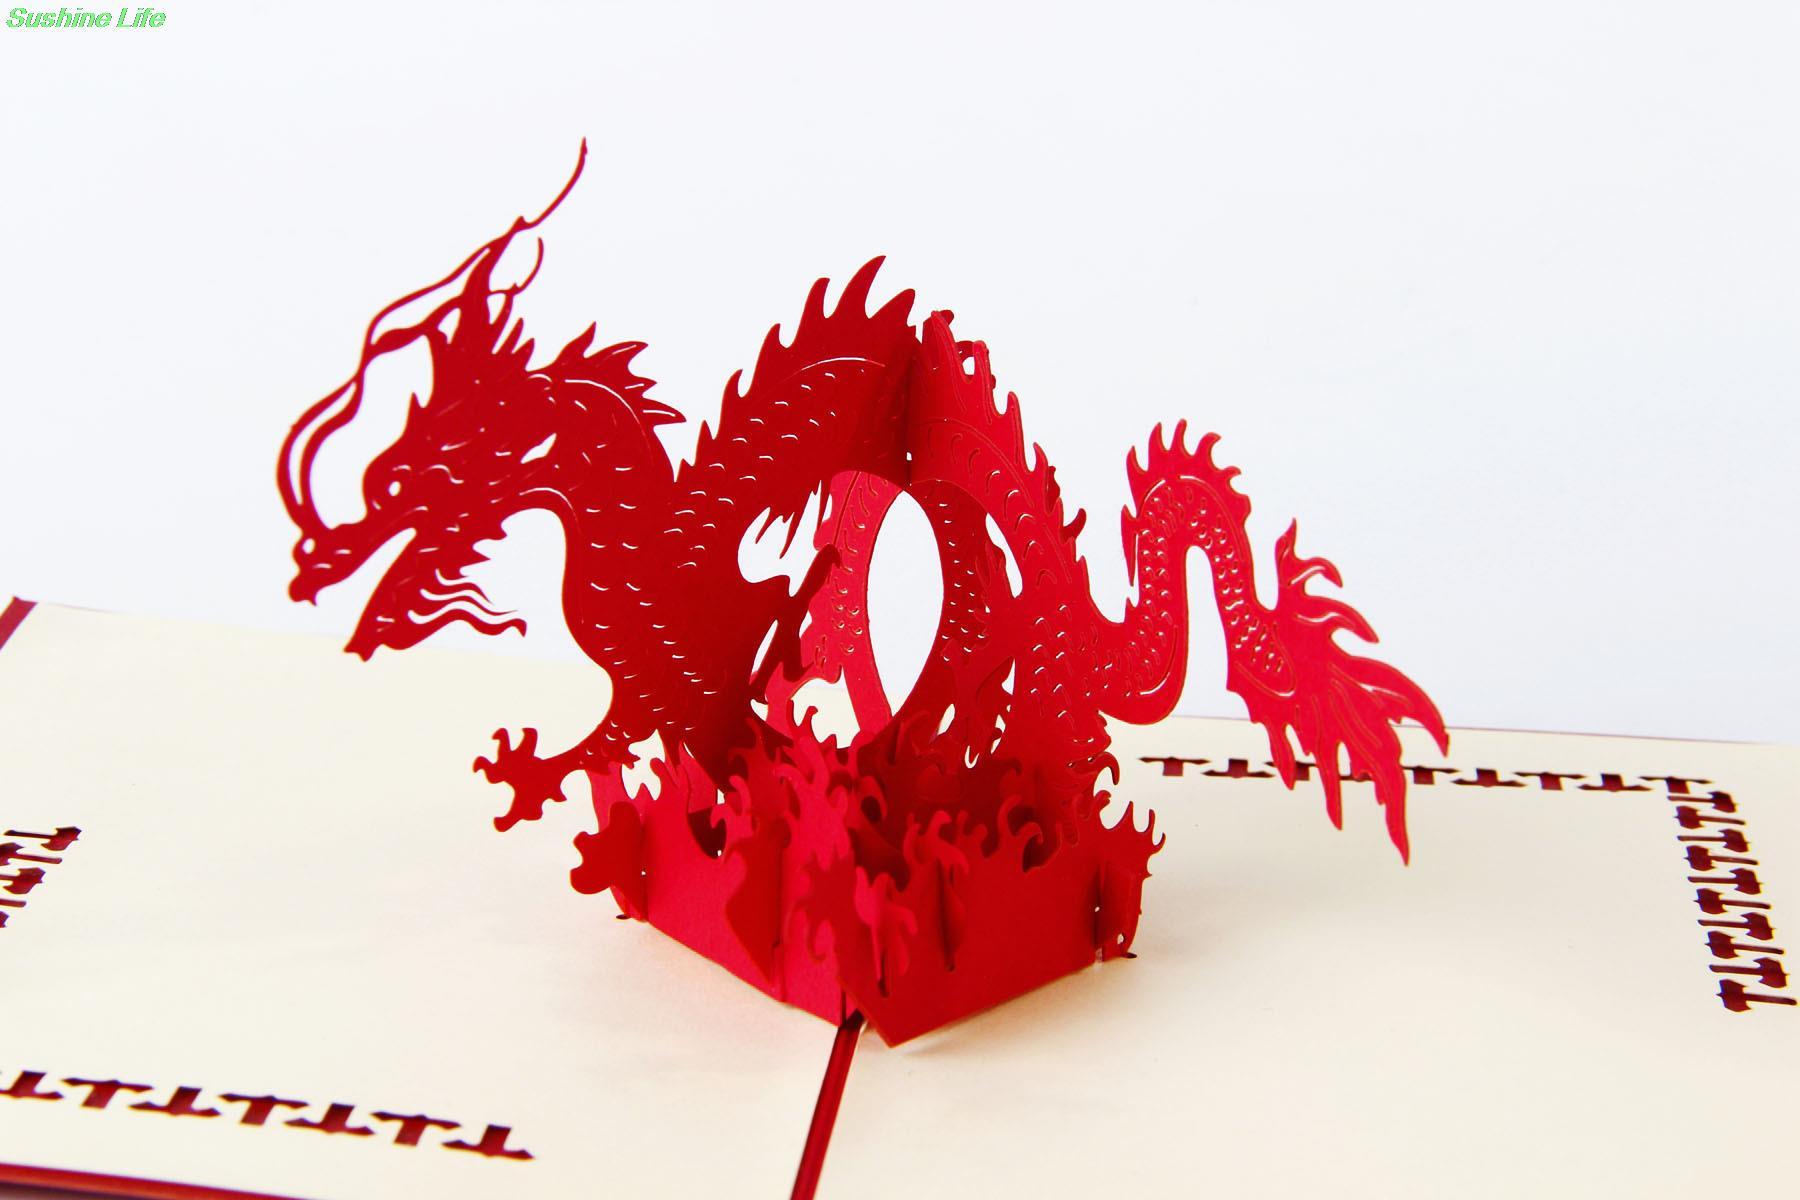 3d Scanner Image: 3d Origami Dragon   1200x1800